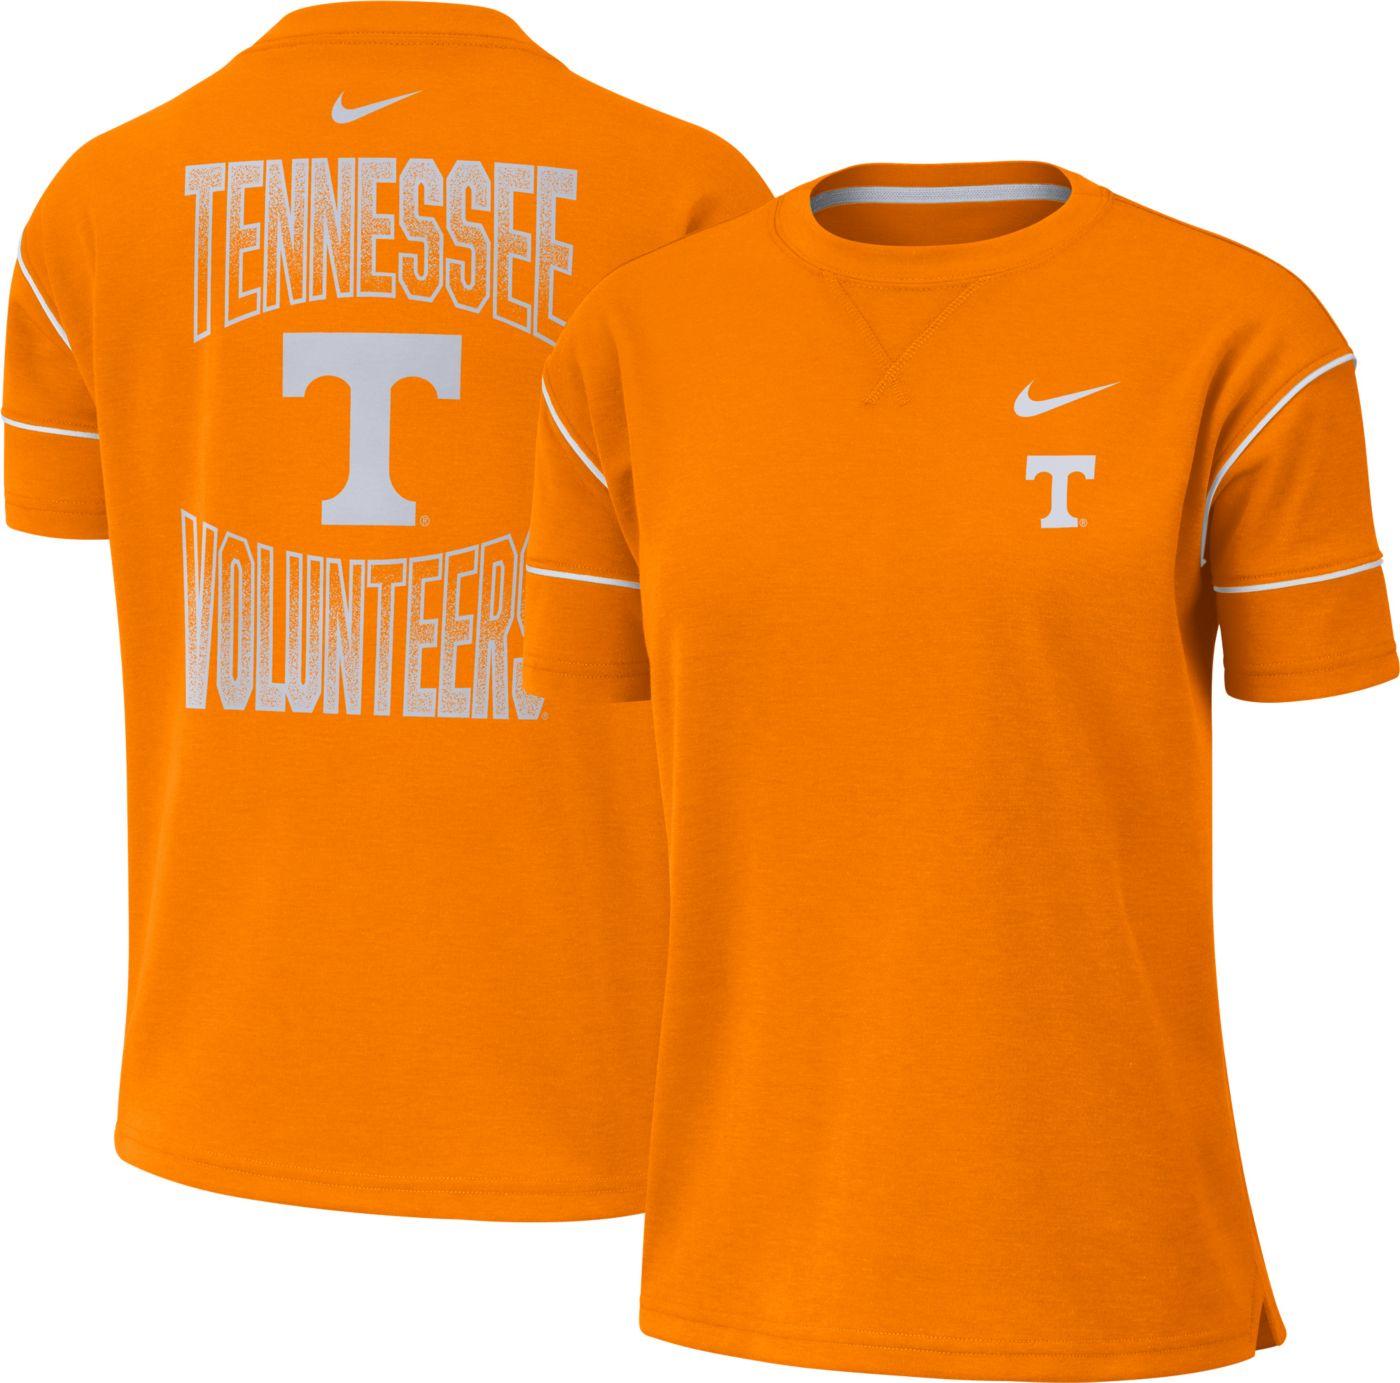 Nike Women's Tennessee Volunteers Tennessee Orange Breathe Crew Neck T-Shirt